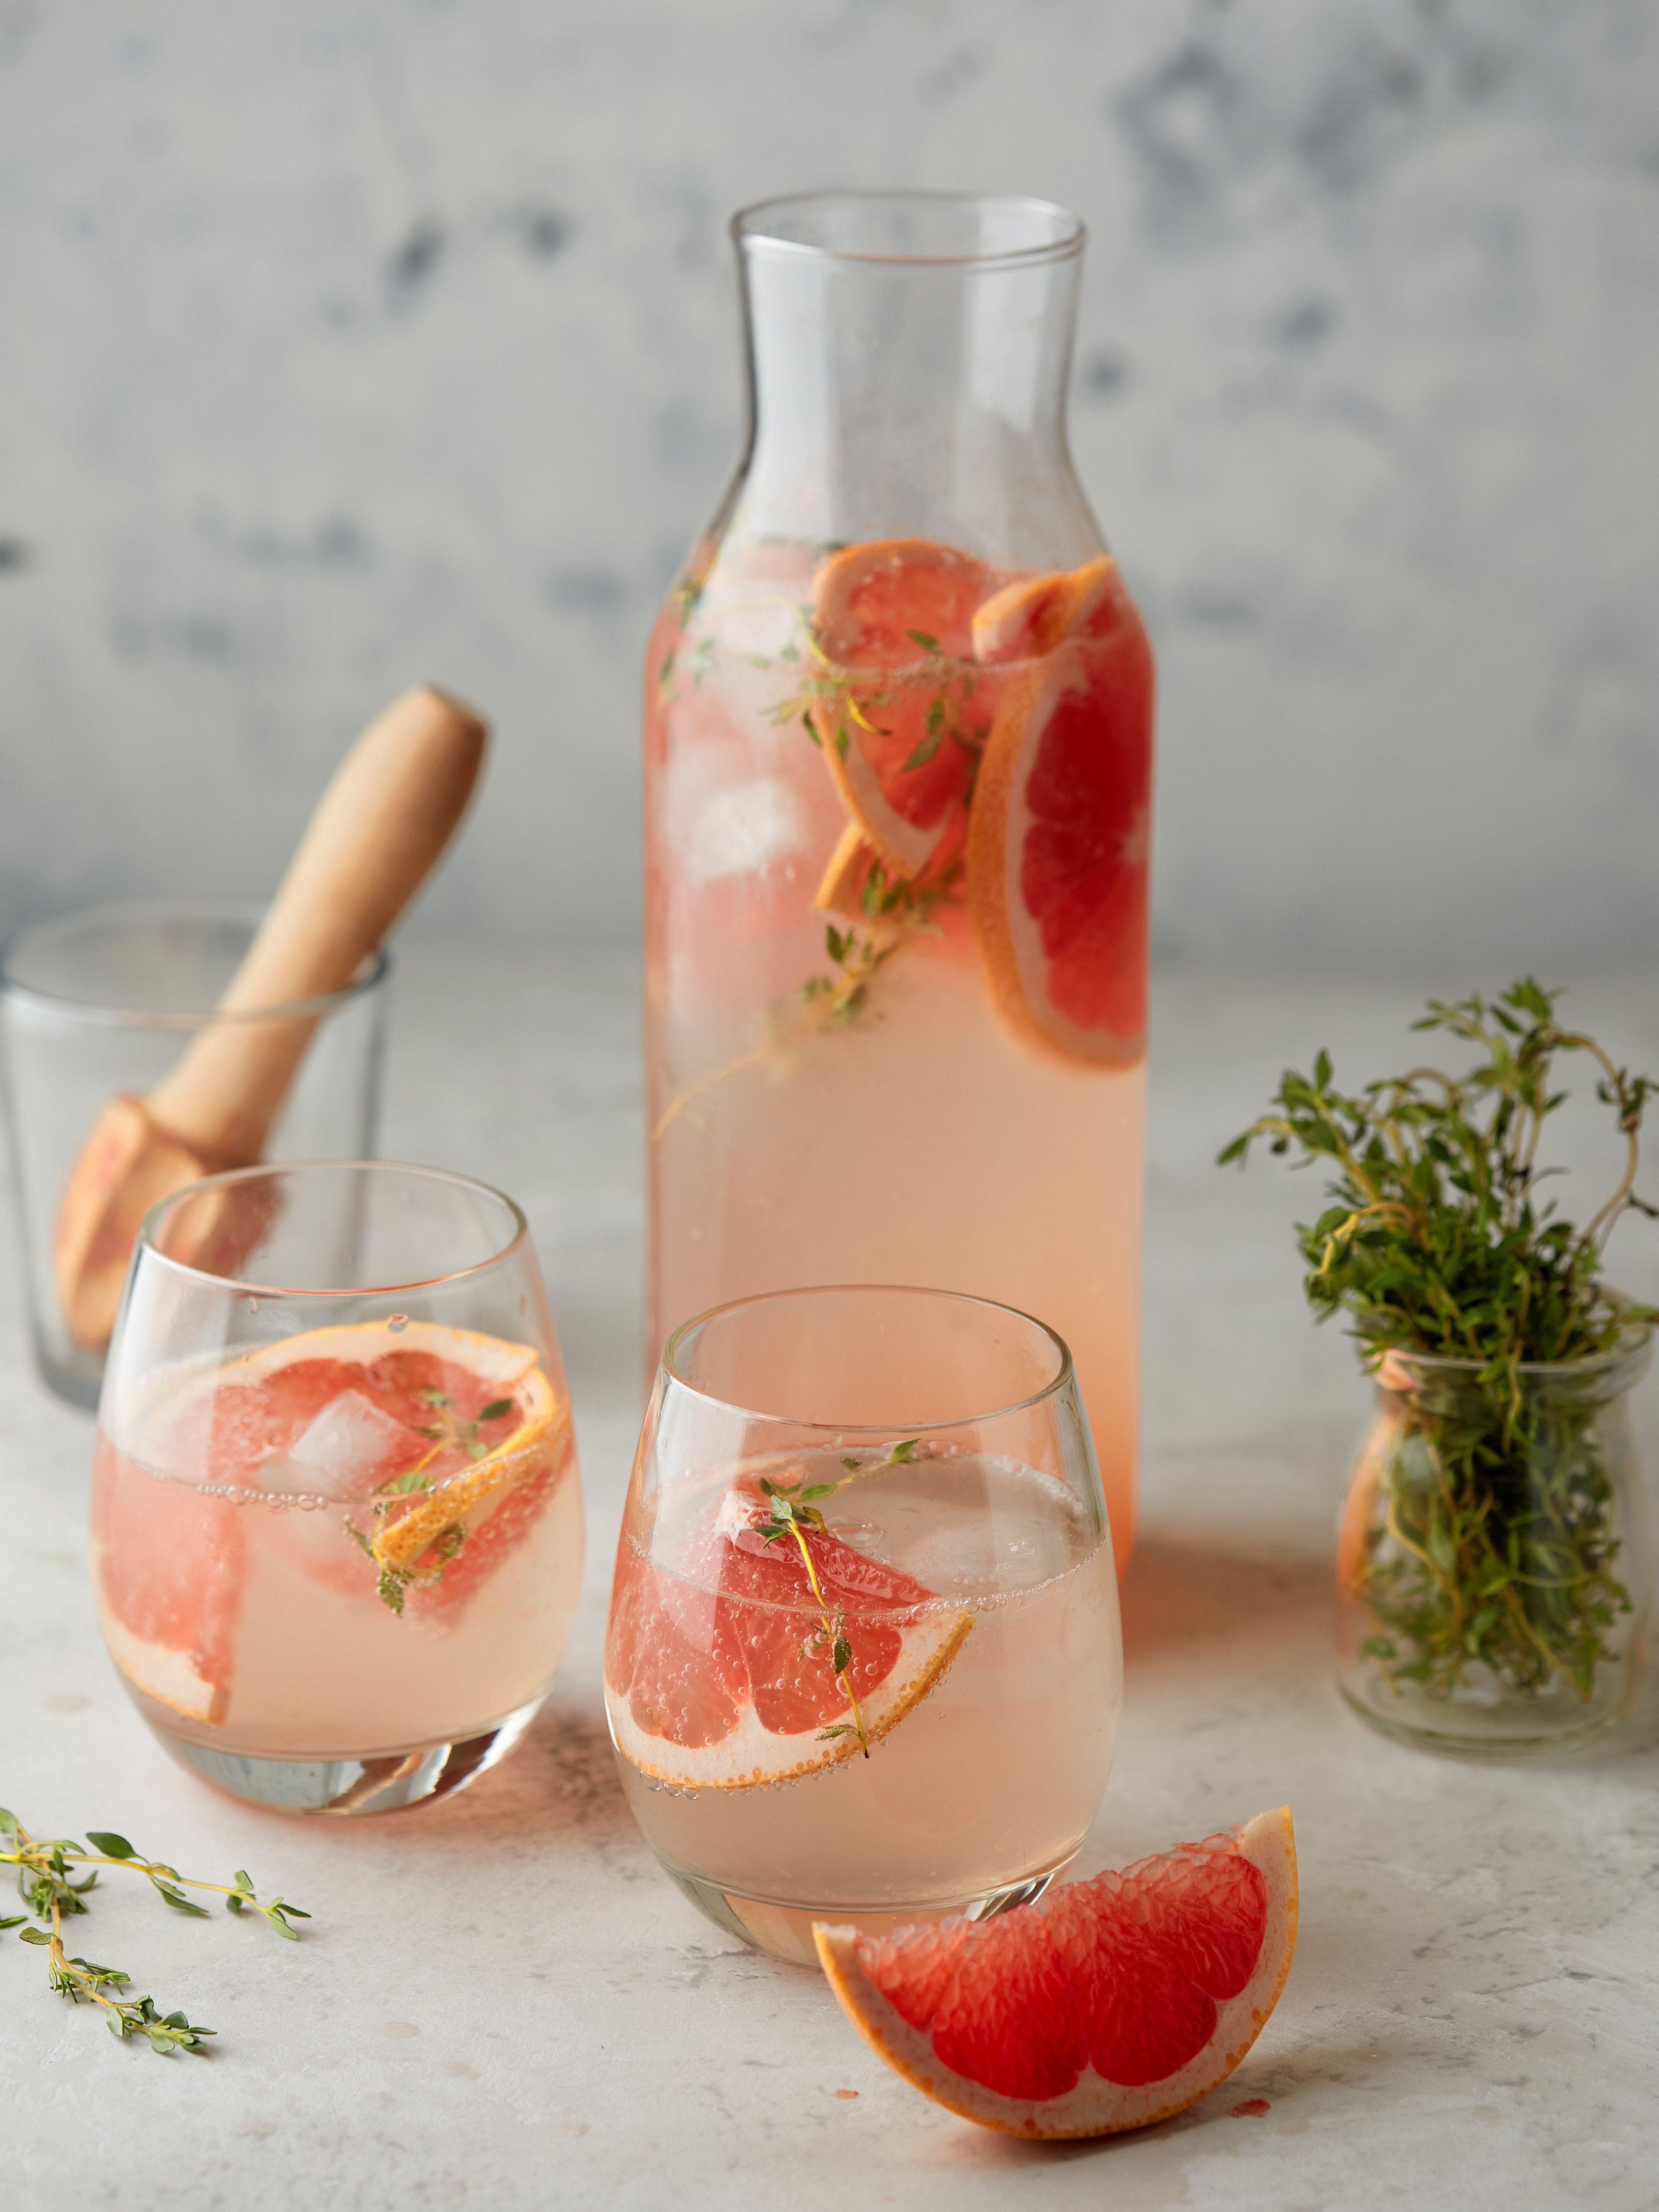 Grapefruit Thyme Infused Sparkling Water ماء غازي منسم بالبامبلموس والزعتر Grapefruits Grapefruit Uses Sparkling Water